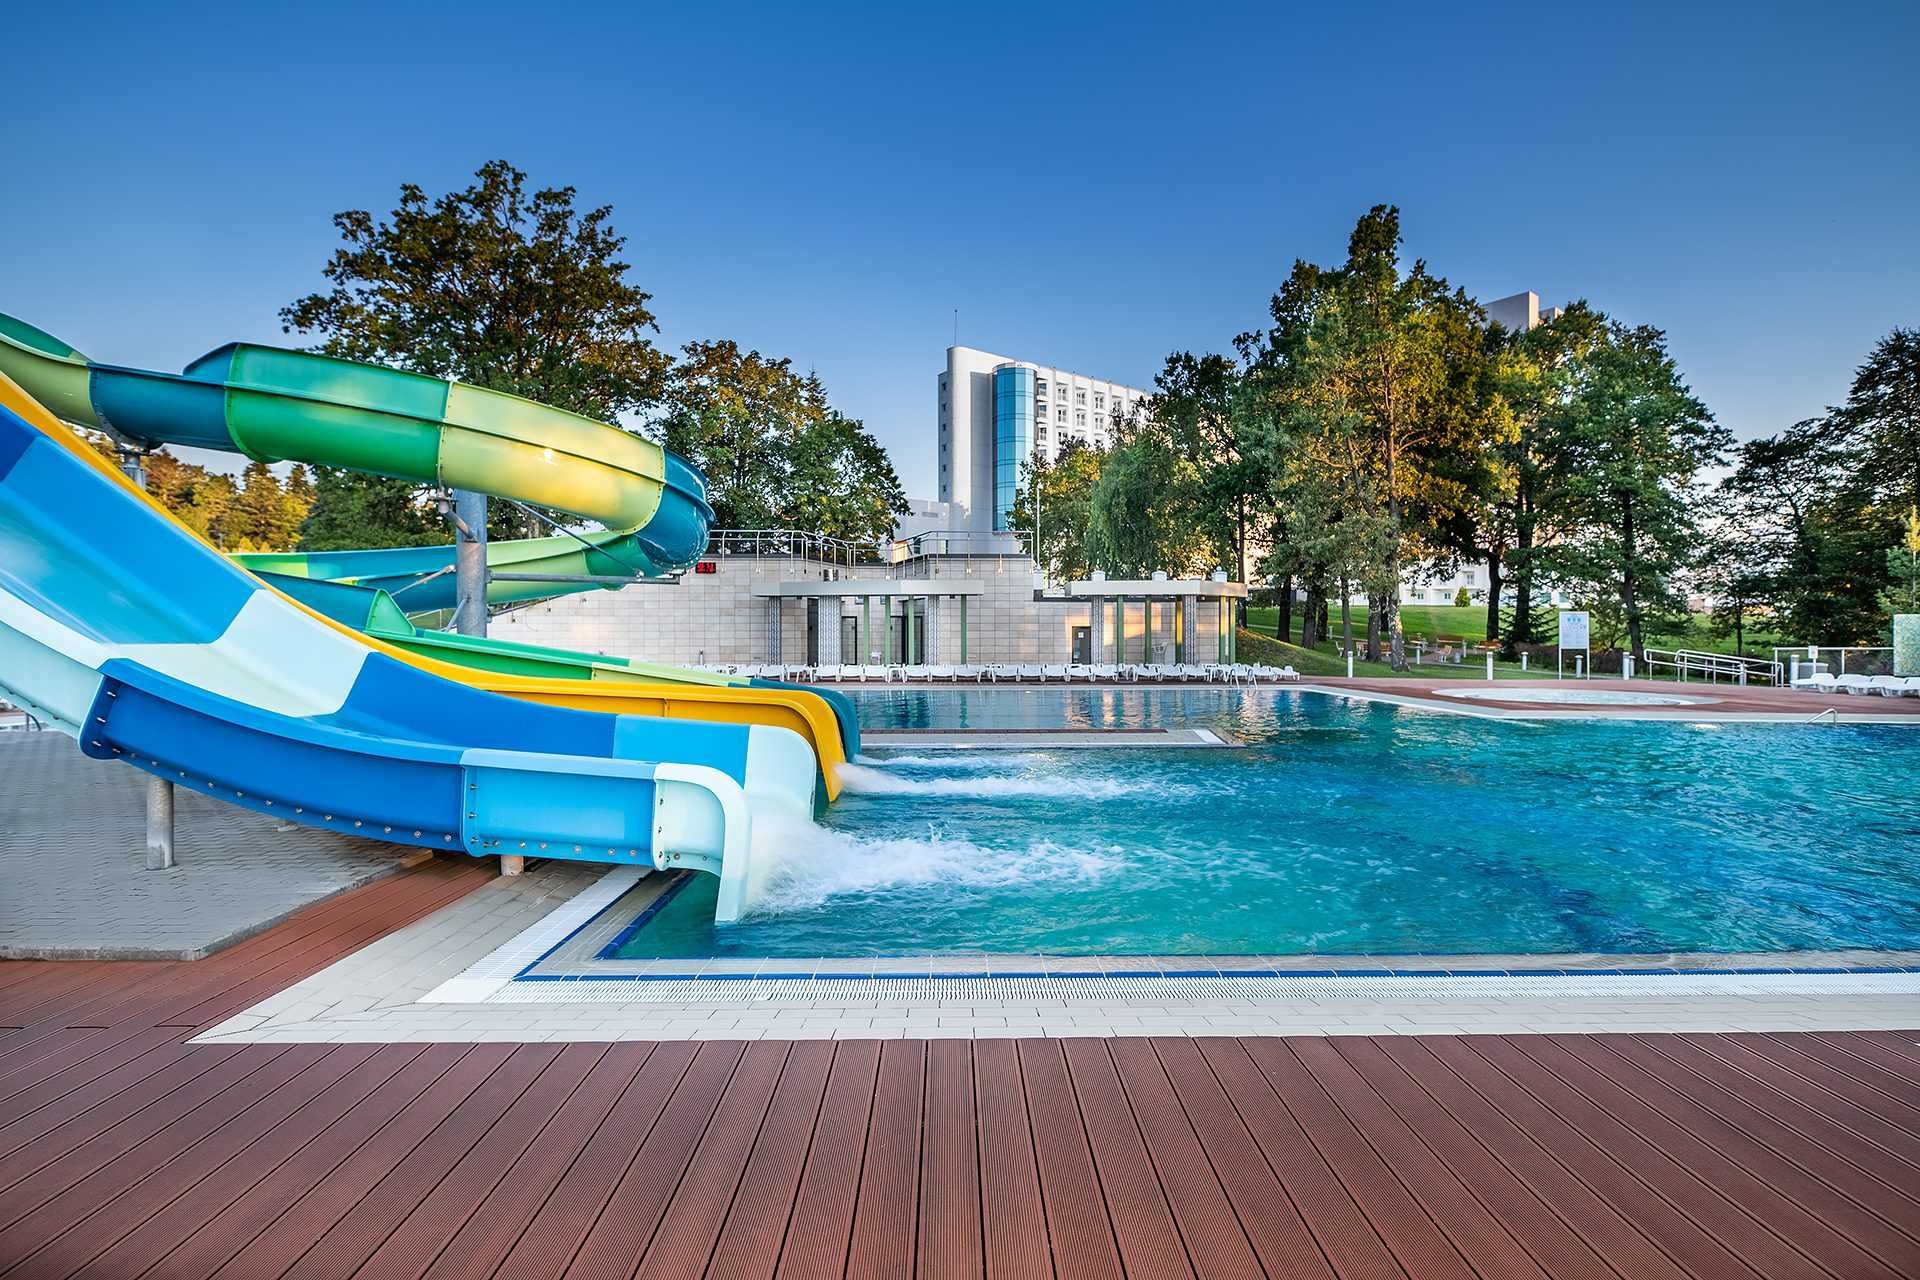 Water slides, Rixos Pryksrpattya